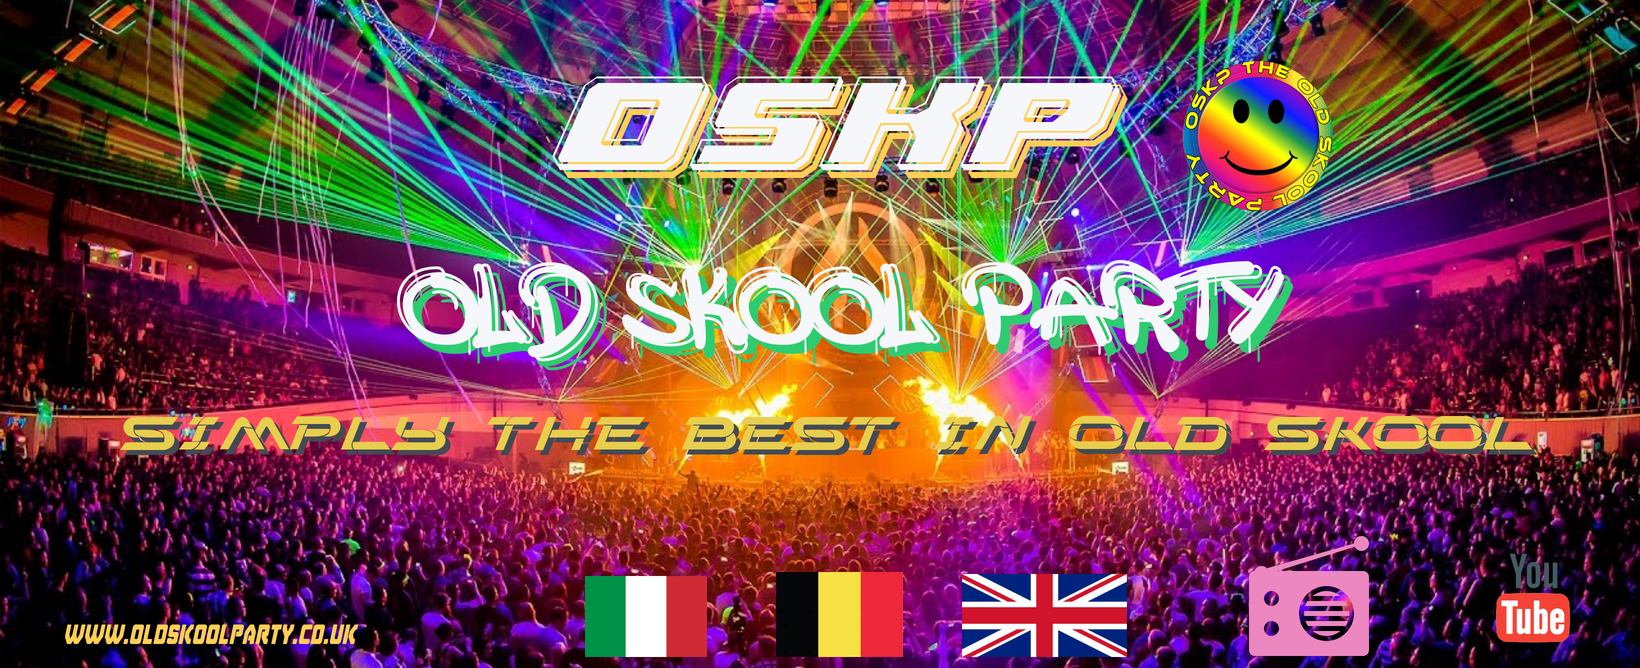 OSKP: THE OLD SKOOL PARTY